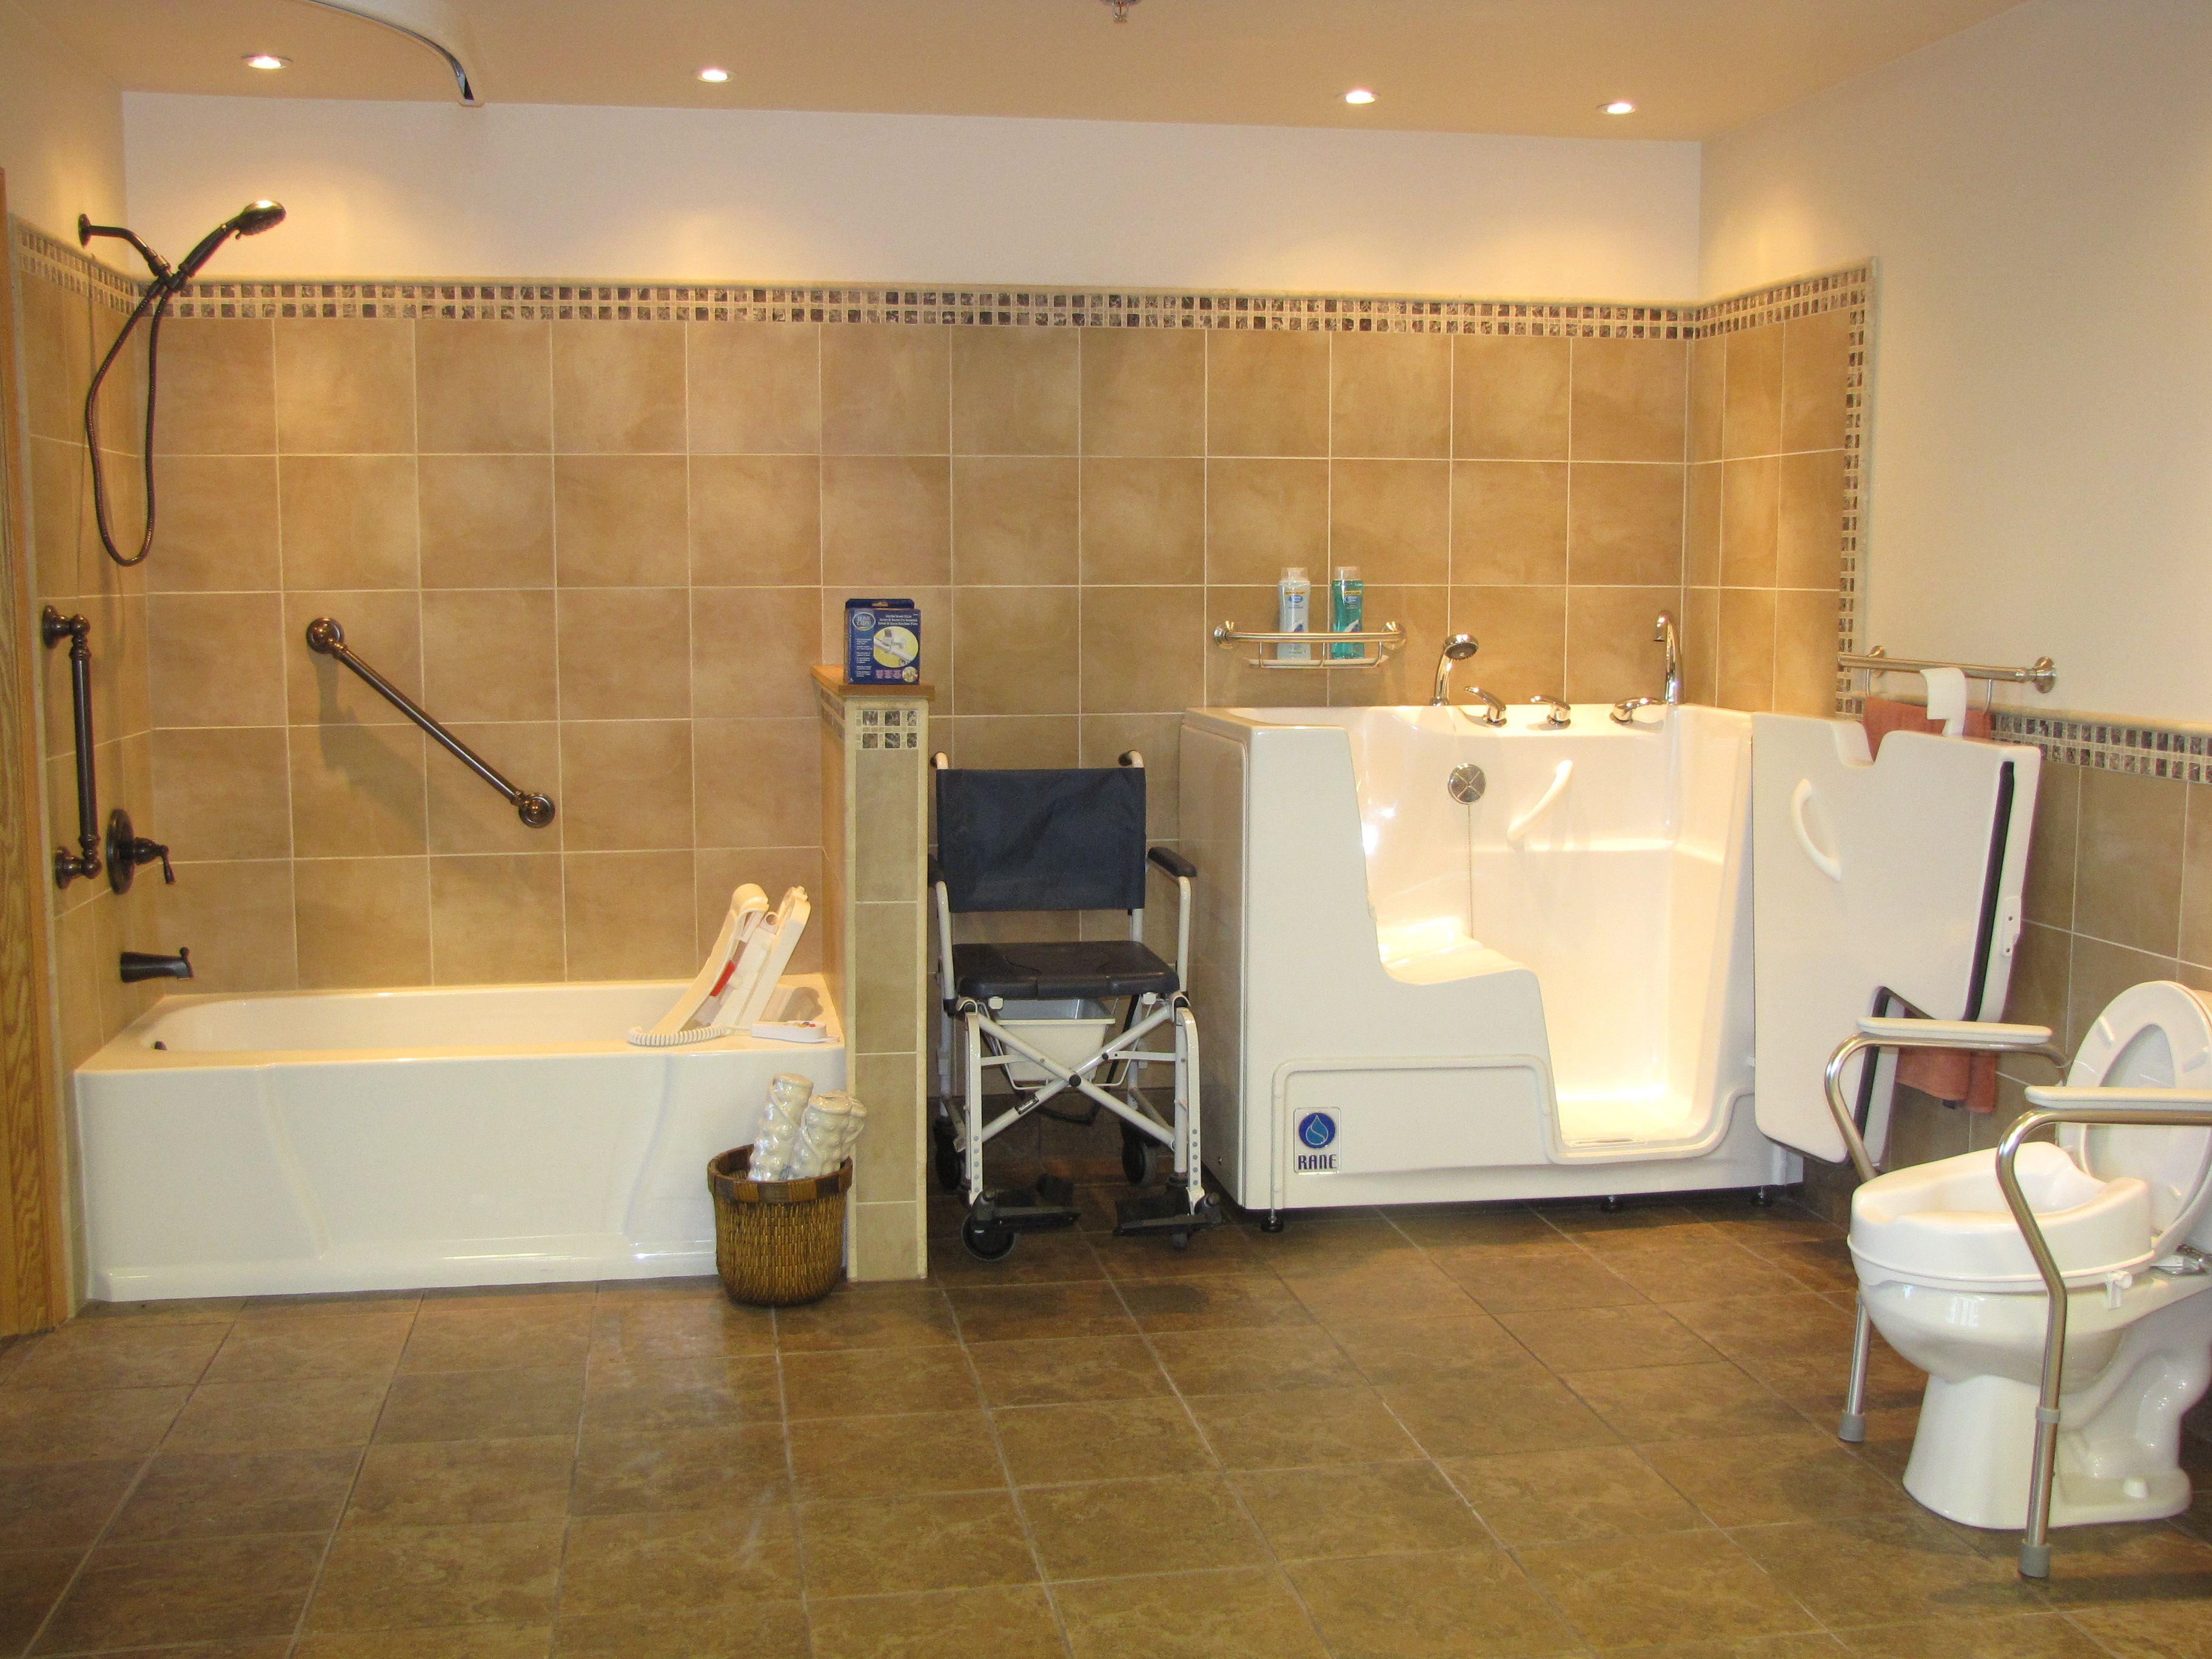 Home Bathroom Modifications for Seniors